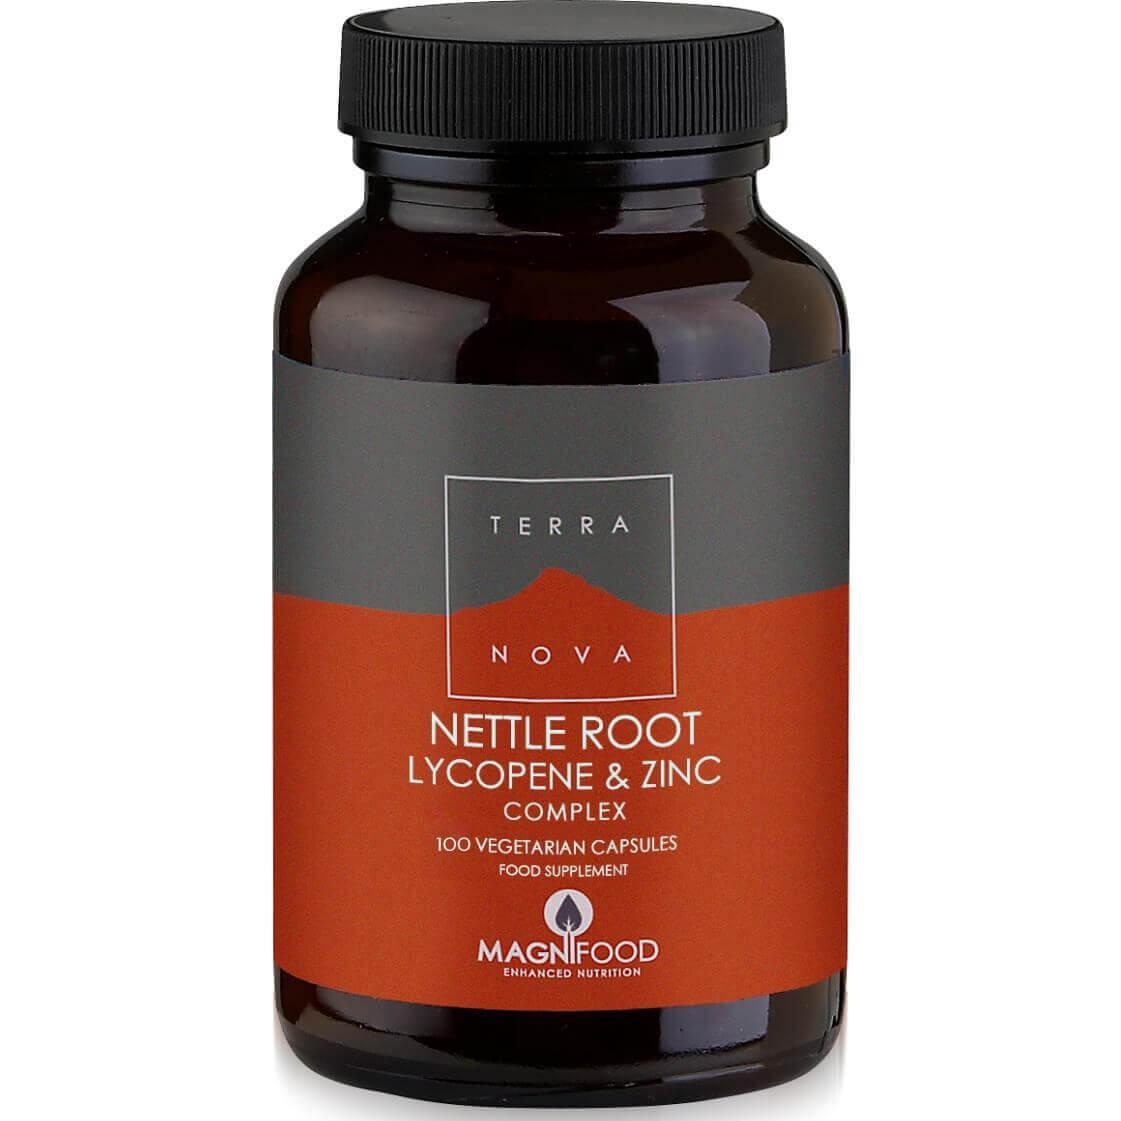 Terranova Nettle Root Lycopene & Zinc Complex Prostate Support Η Ολοκληρωμένη Σύνθεση Φυτικών Συστατικών για τον Προστάτη – 100 veg. caps